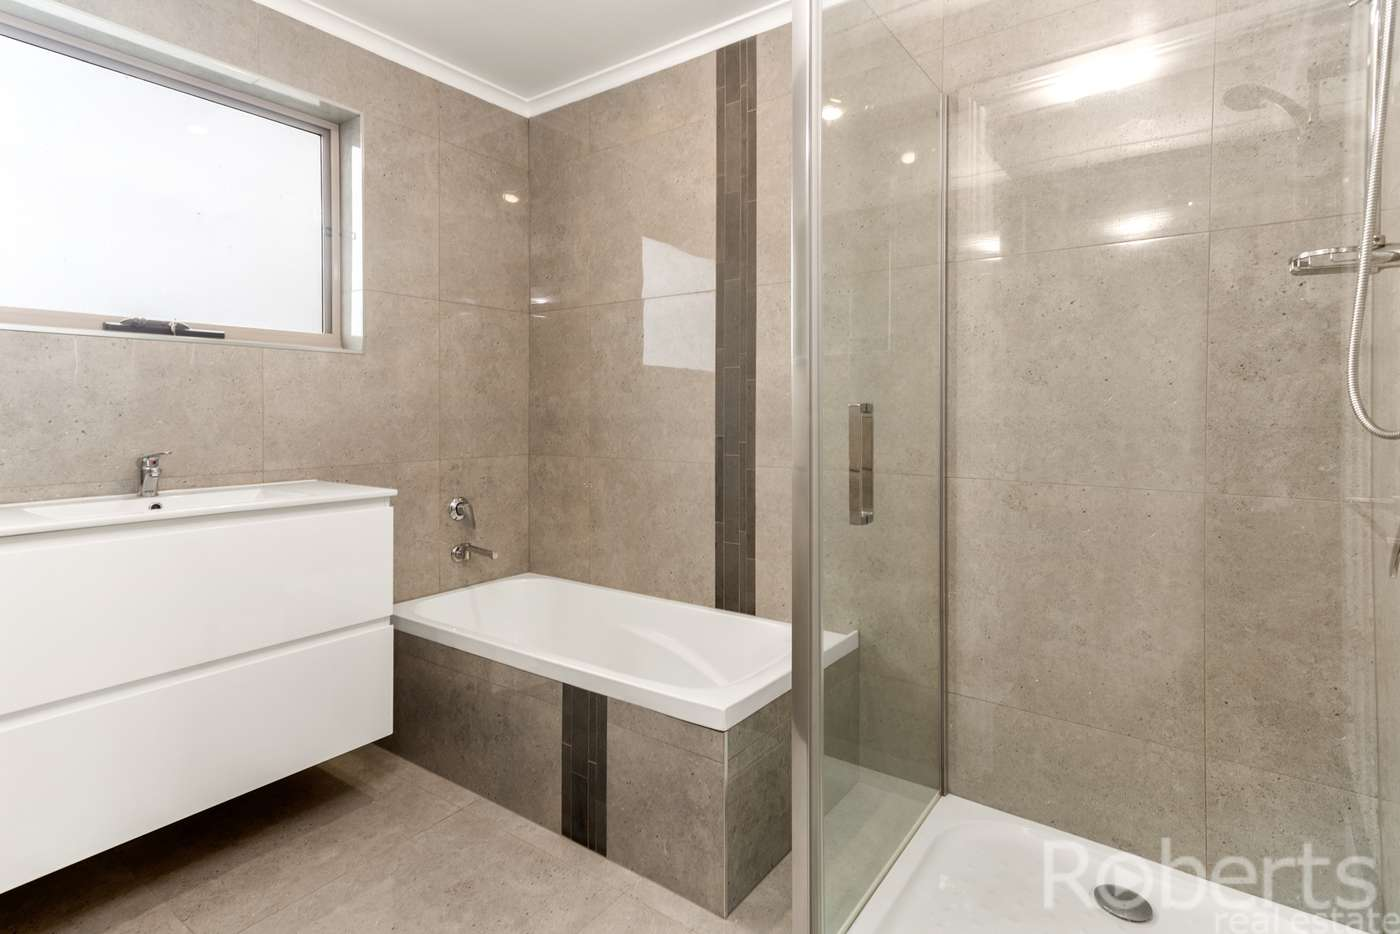 Sixth view of Homely house listing, 31 Henrietta Grove, West Launceston TAS 7250